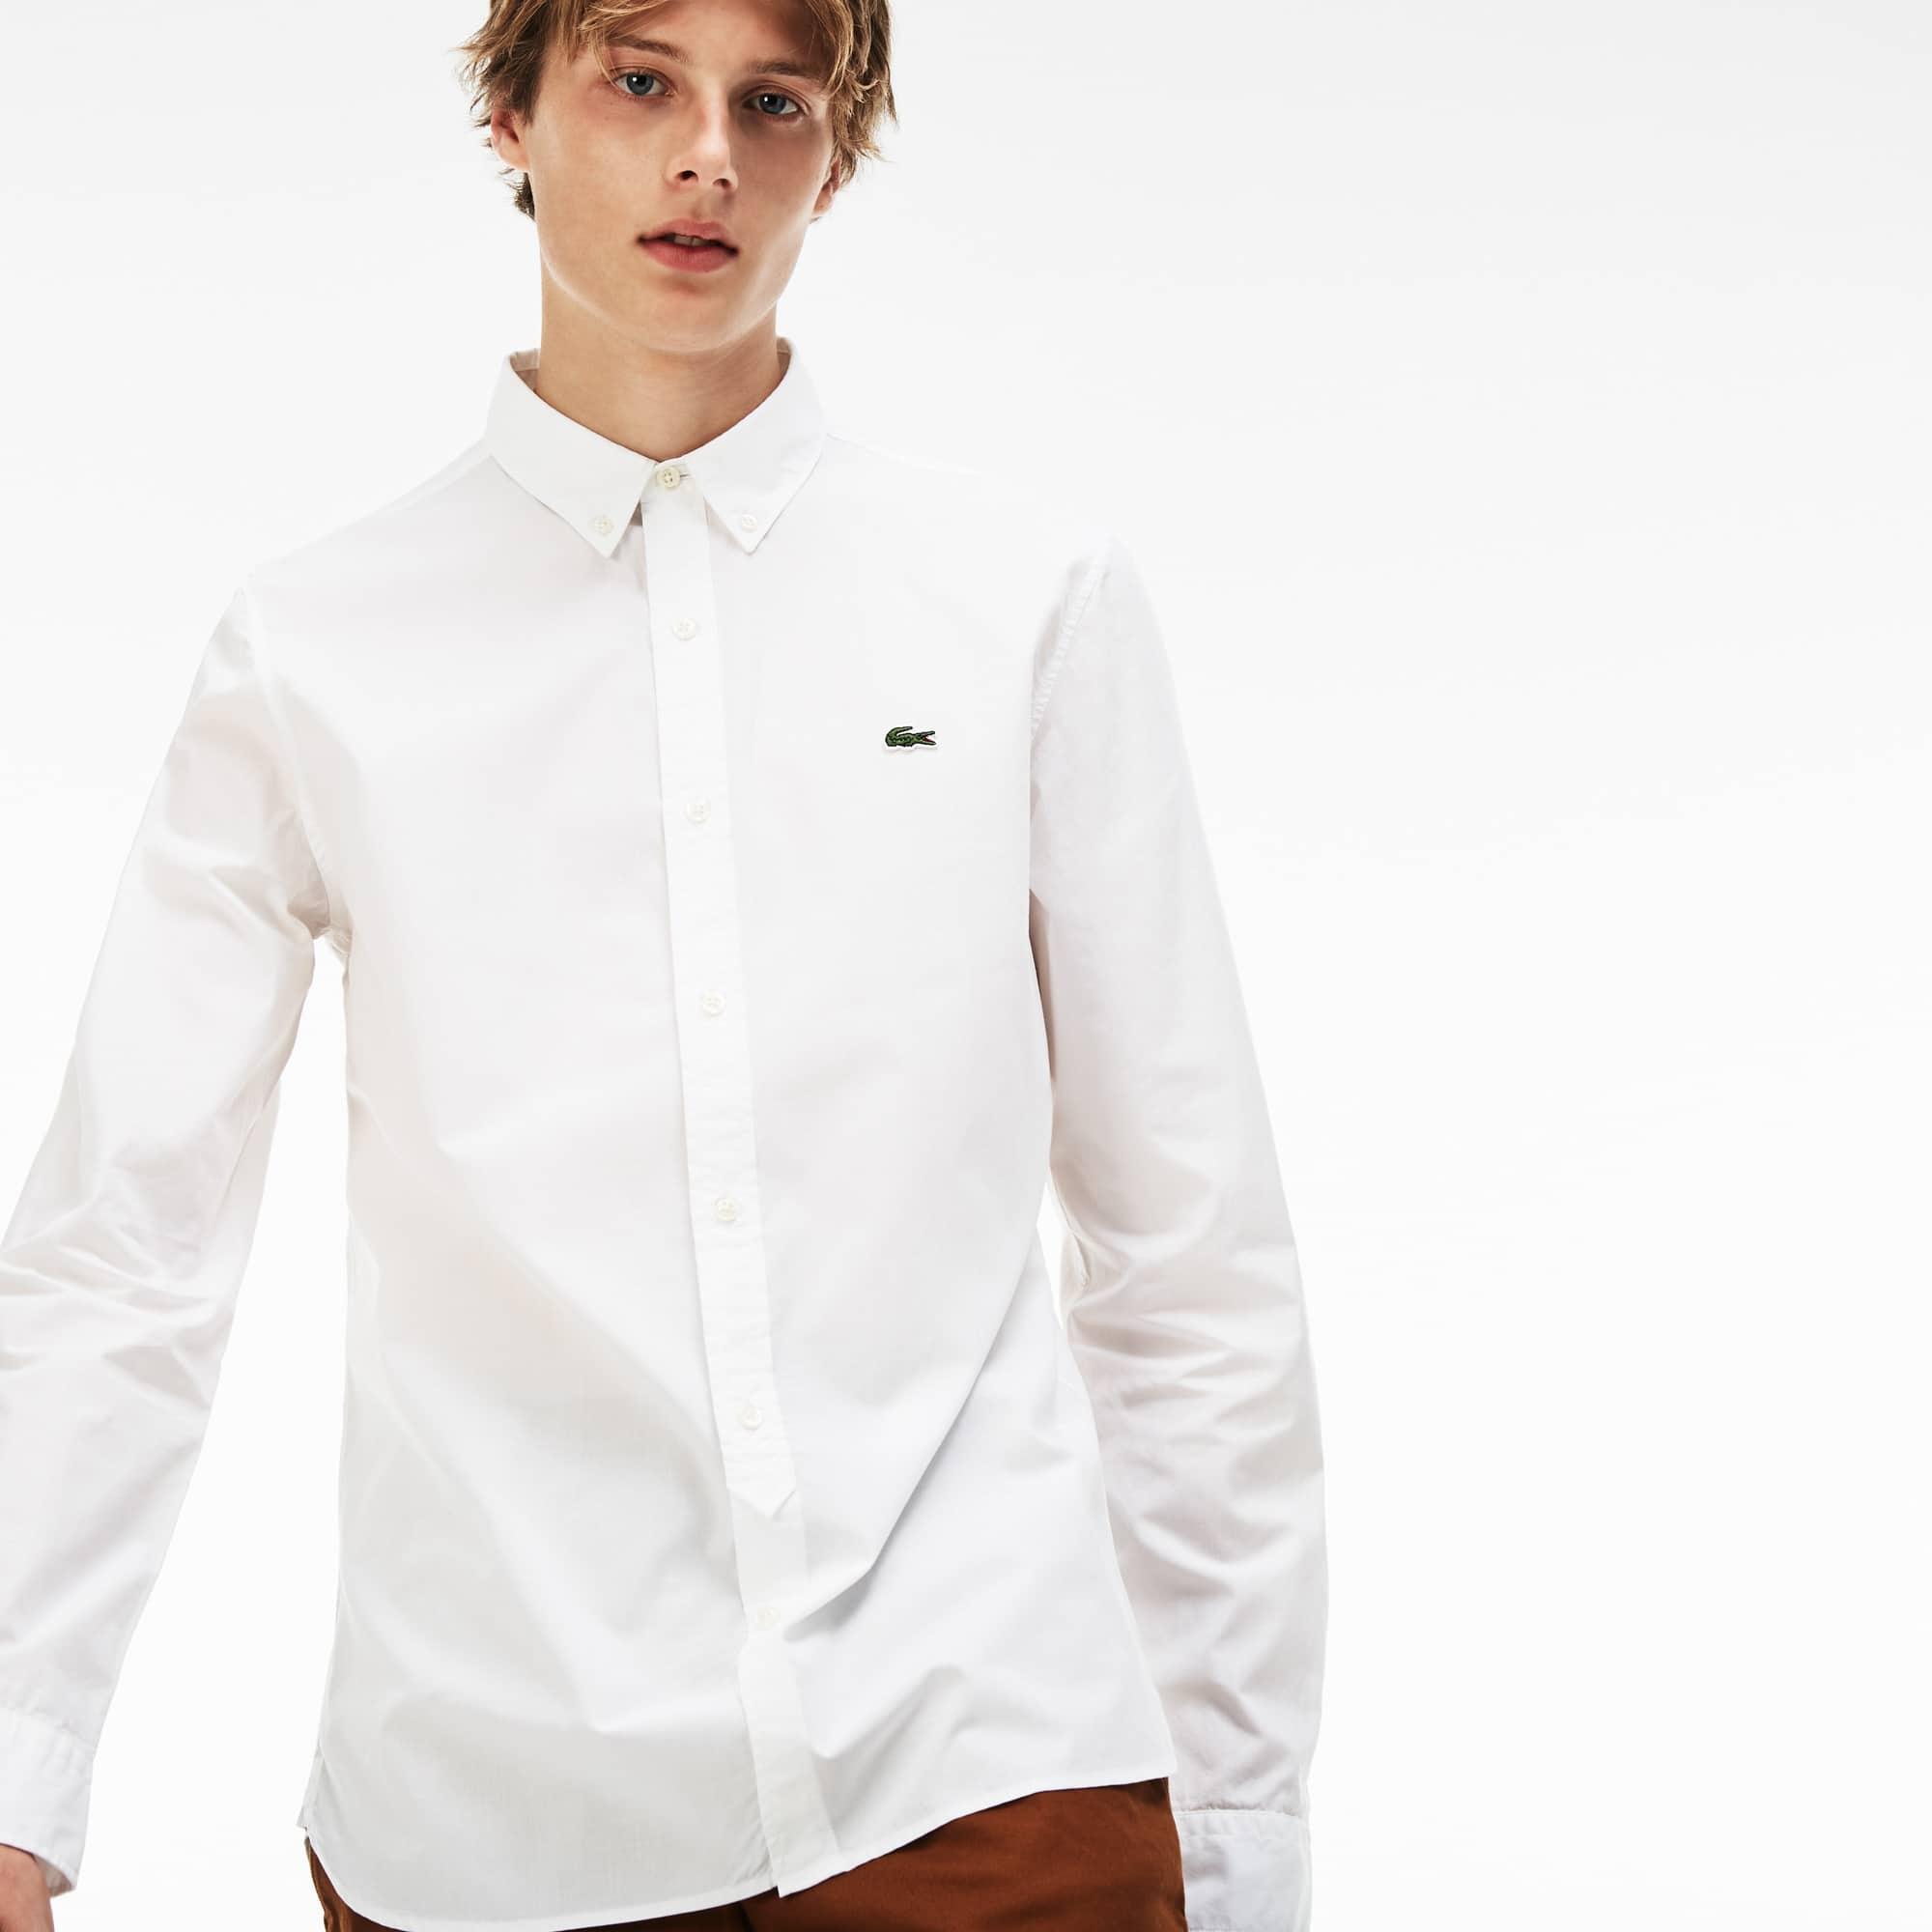 Slim Fit Herren-Hemd aus Baumwoll-Popeline LACOSTE L!VE